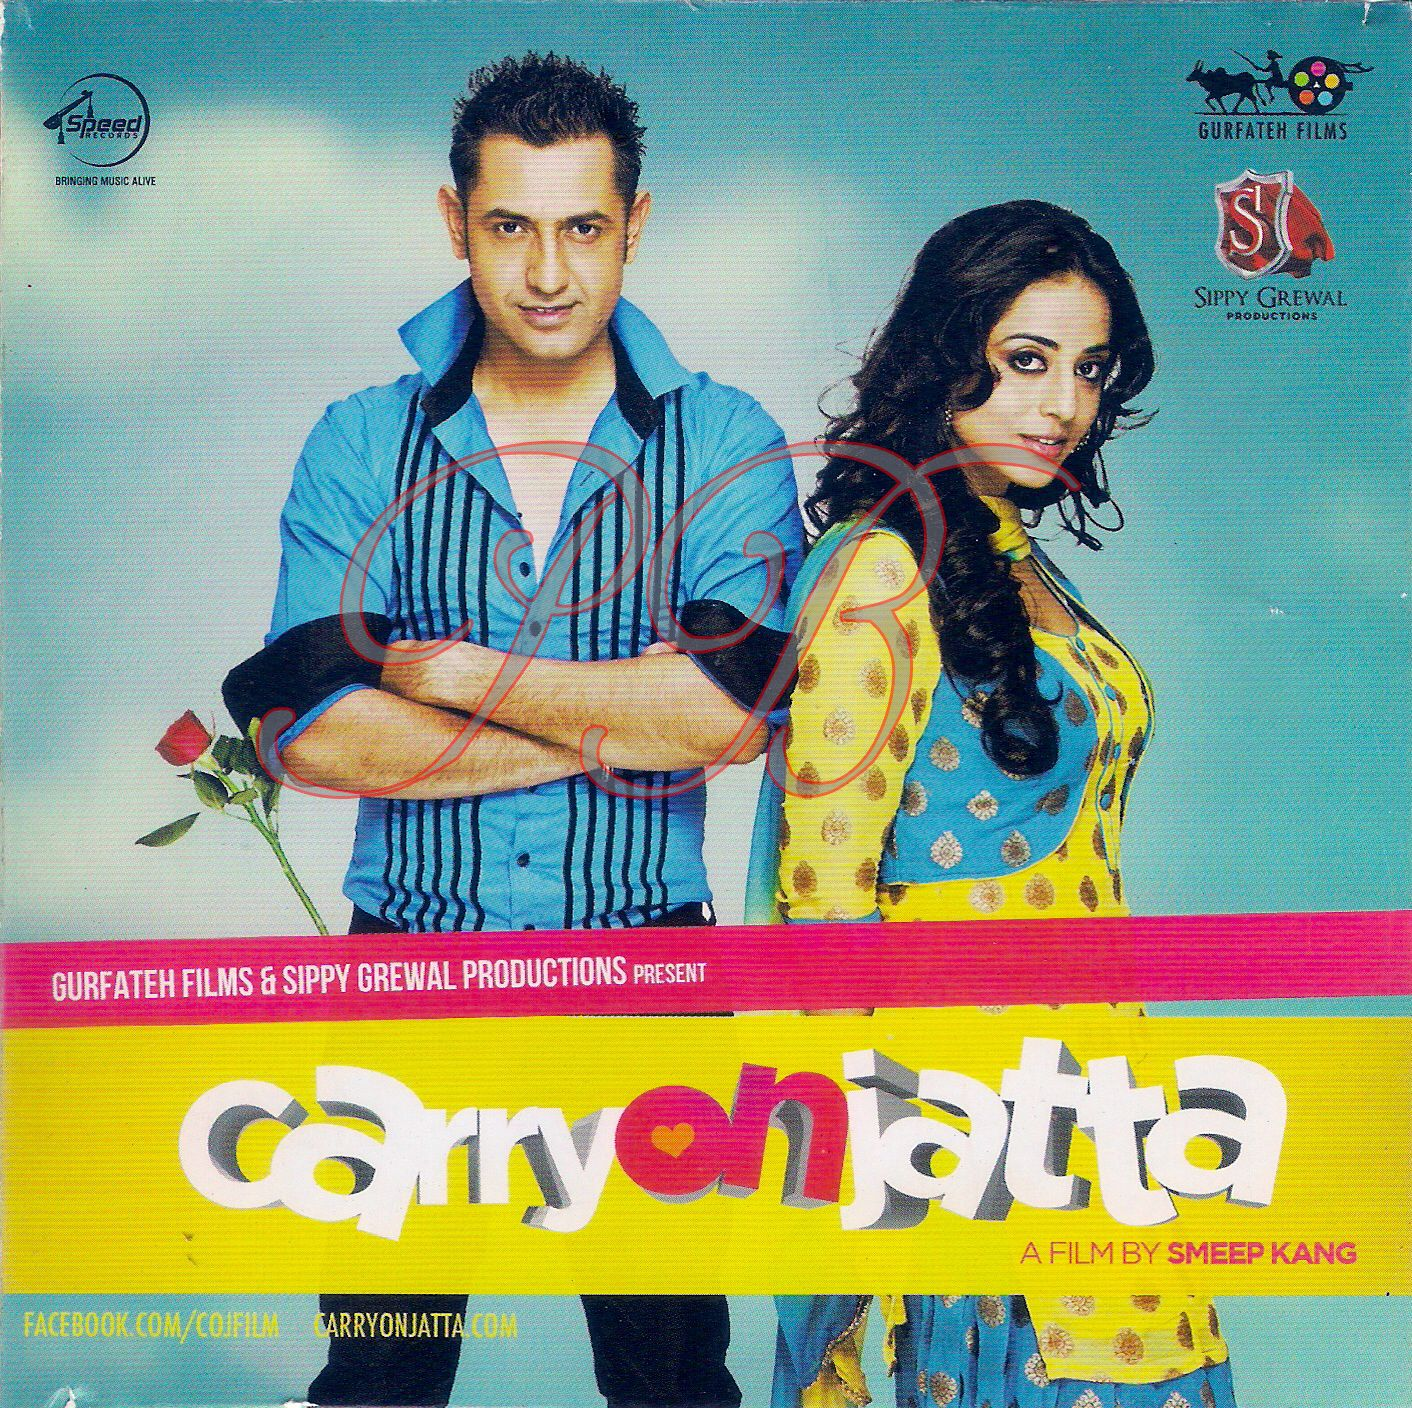 Carry on jatta 2 2018 movie download 480p mkv mp4 full free.